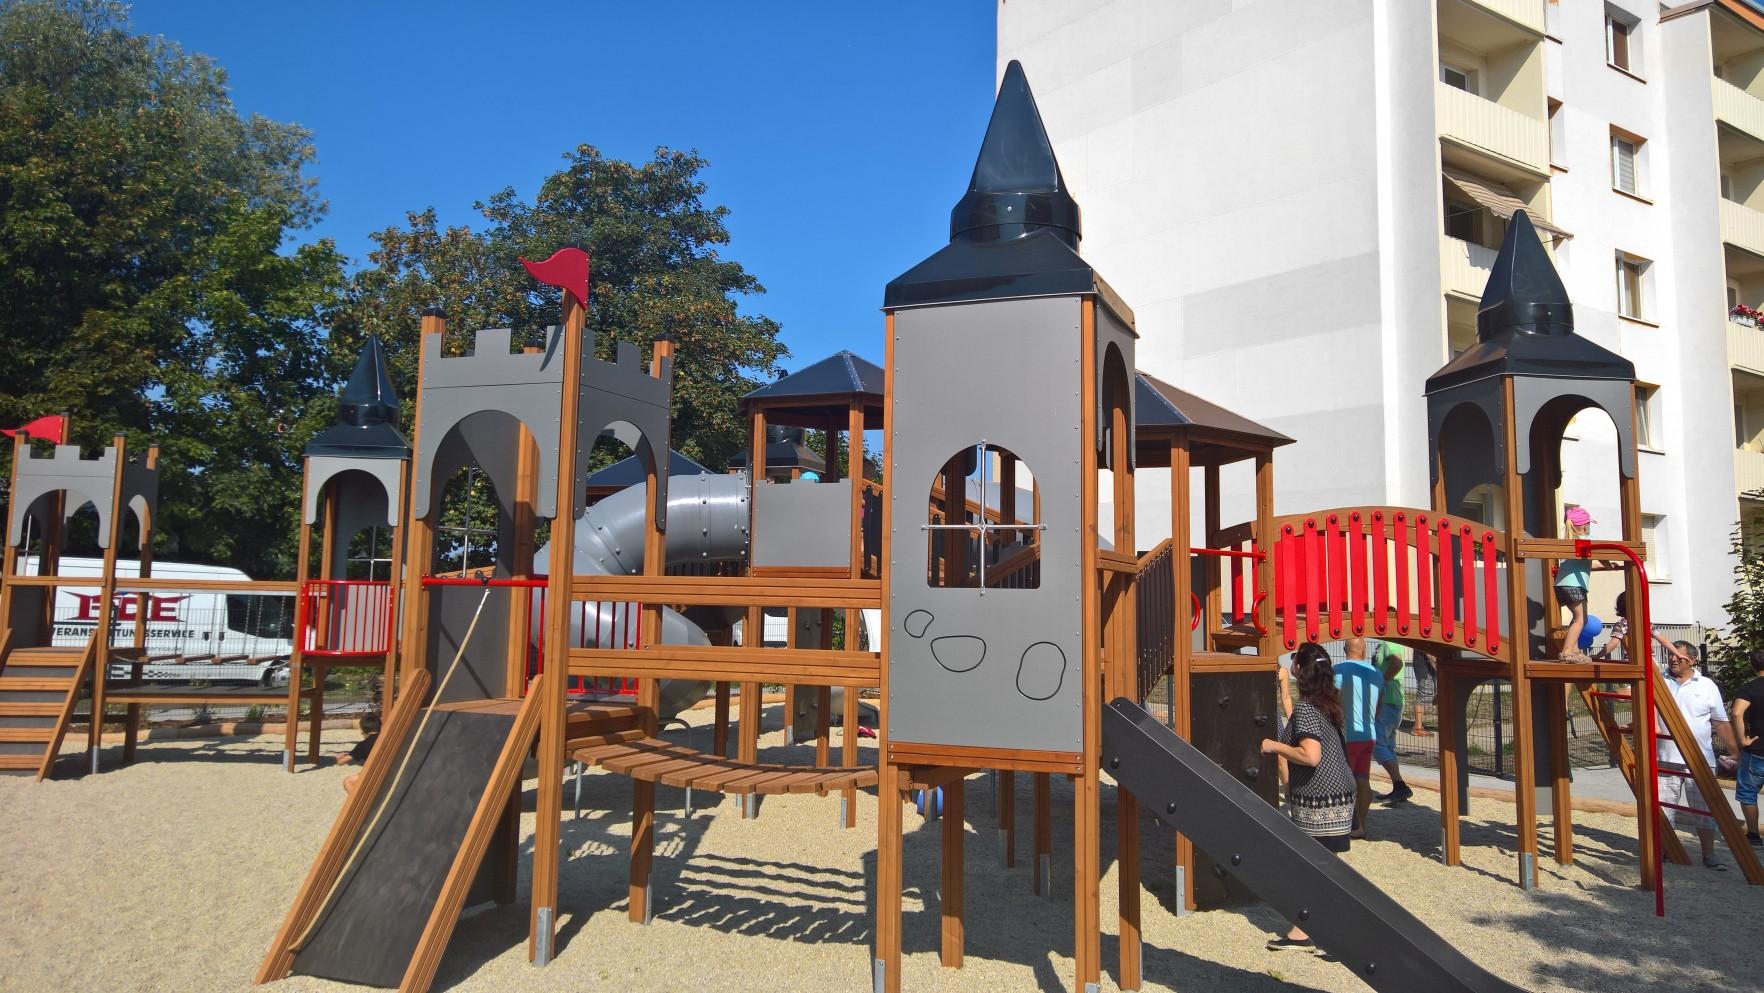 Kamenz Spielplatz Lars Laj DE